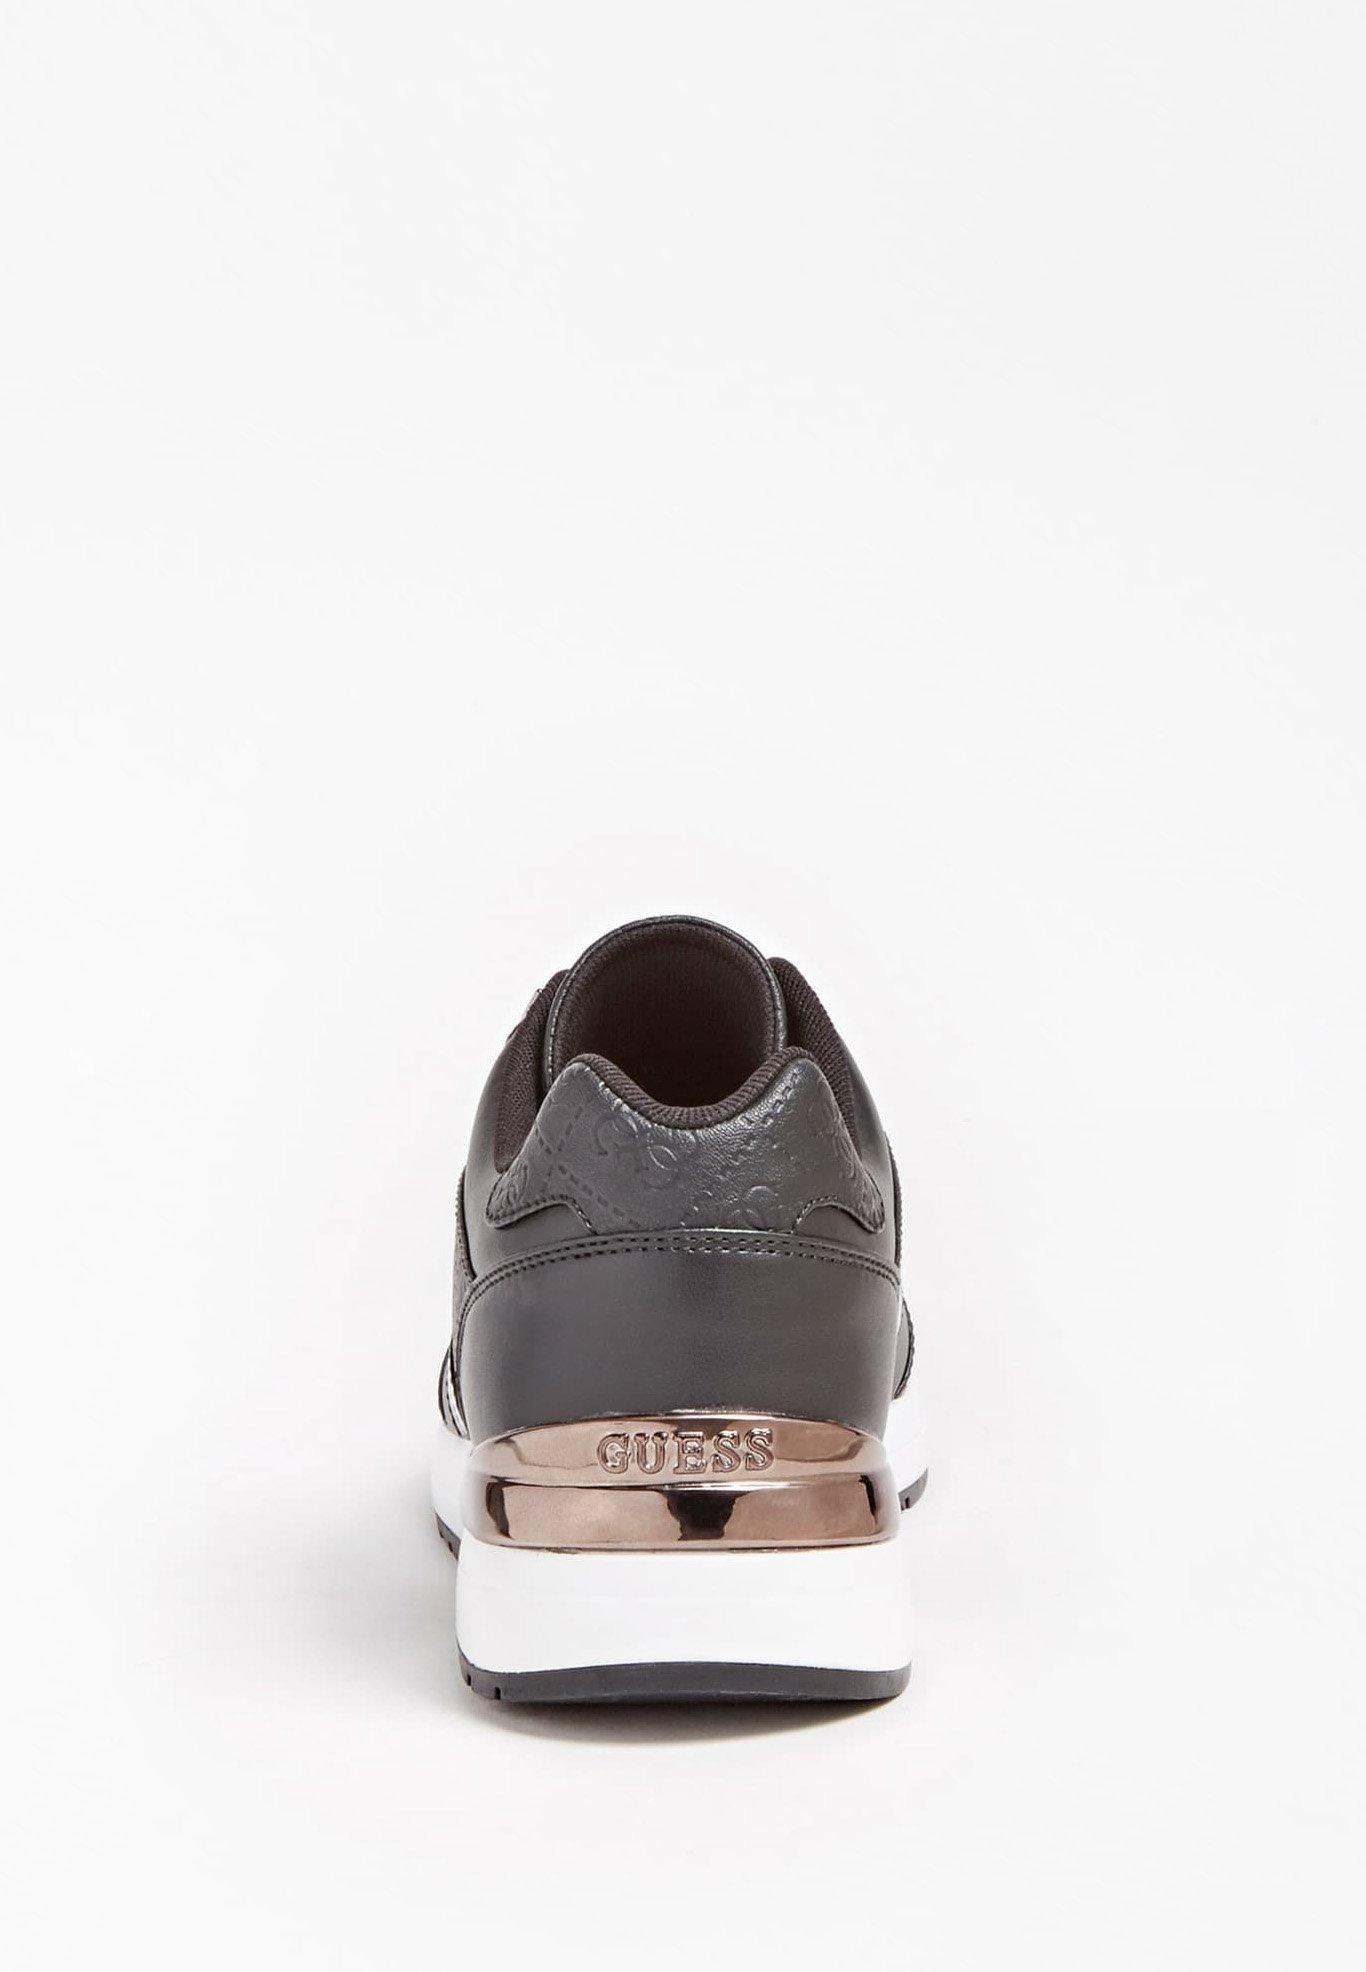 Guess Motiv - Sneaker Low Noir/schwarz